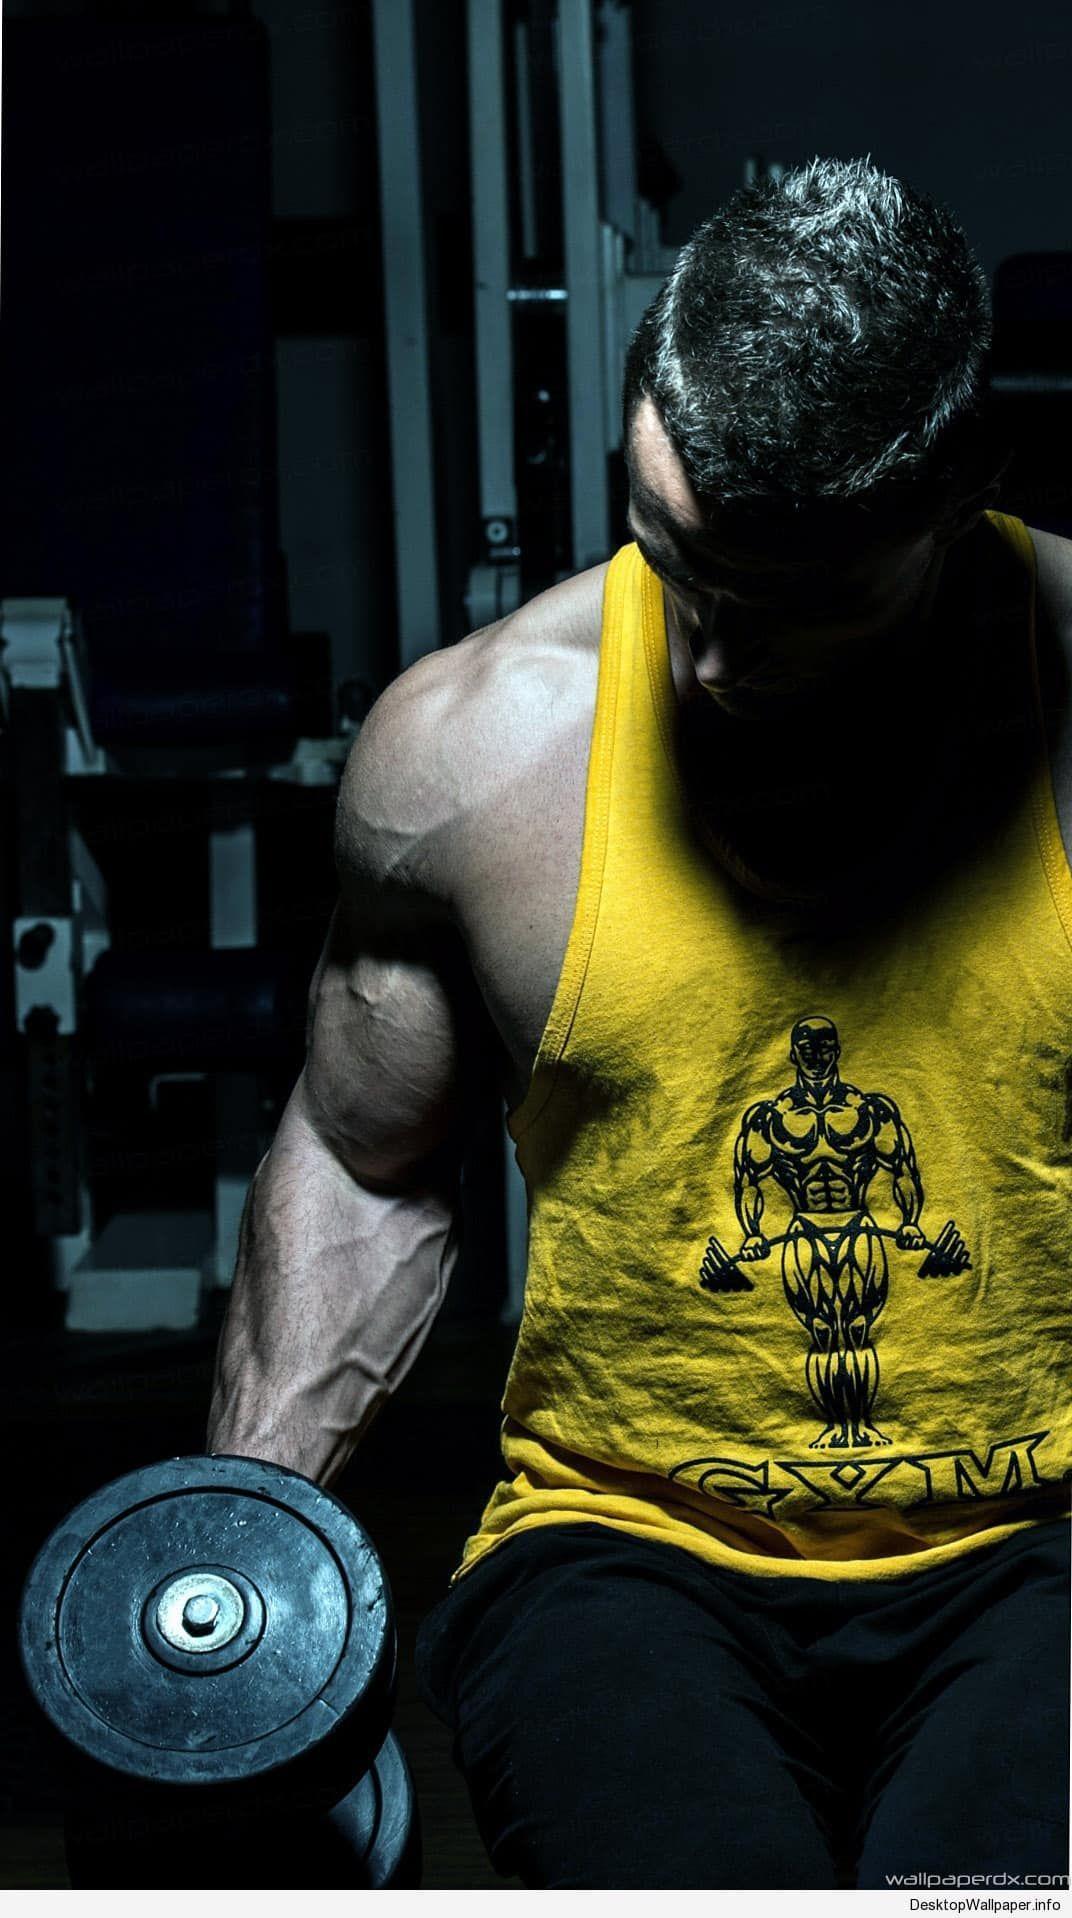 Bodybuilding Iphone Wallpapers Top Free Bodybuilding Iphone Backgrounds Wallpaperaccess